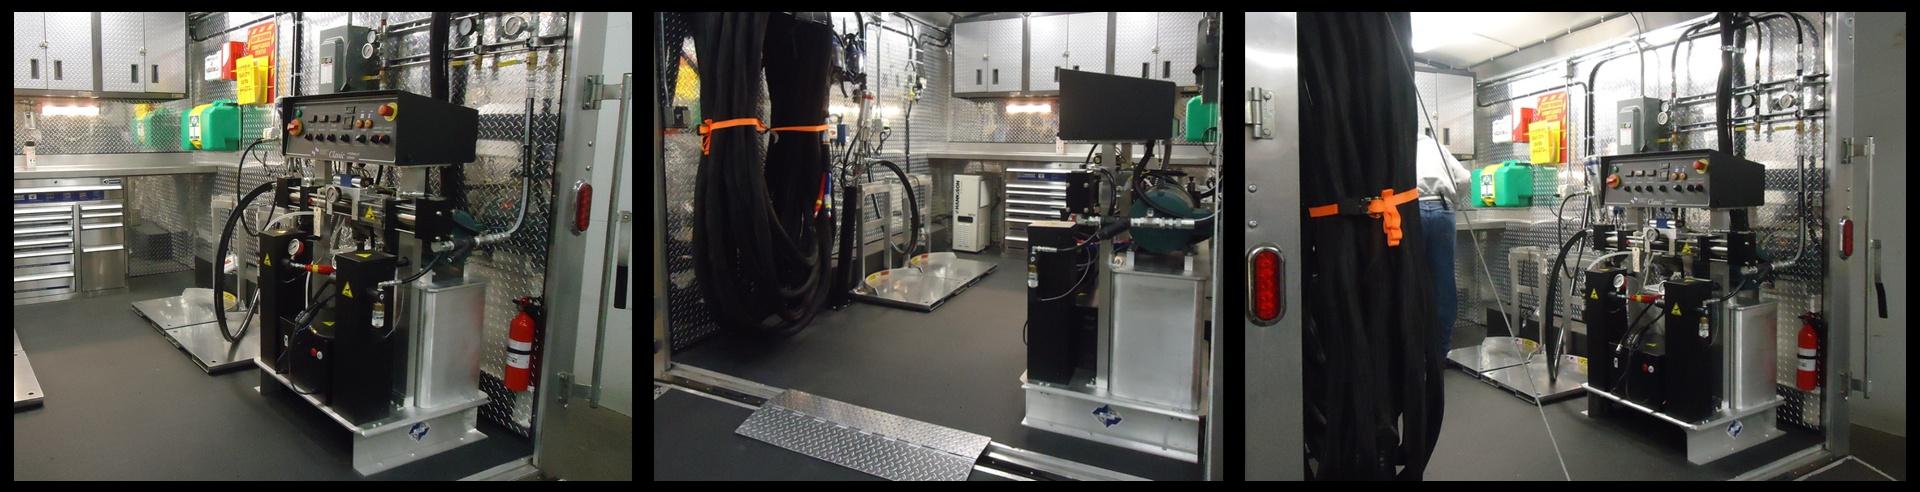 Kamo Leasing Turn Key Insulation Rigs and Equipment